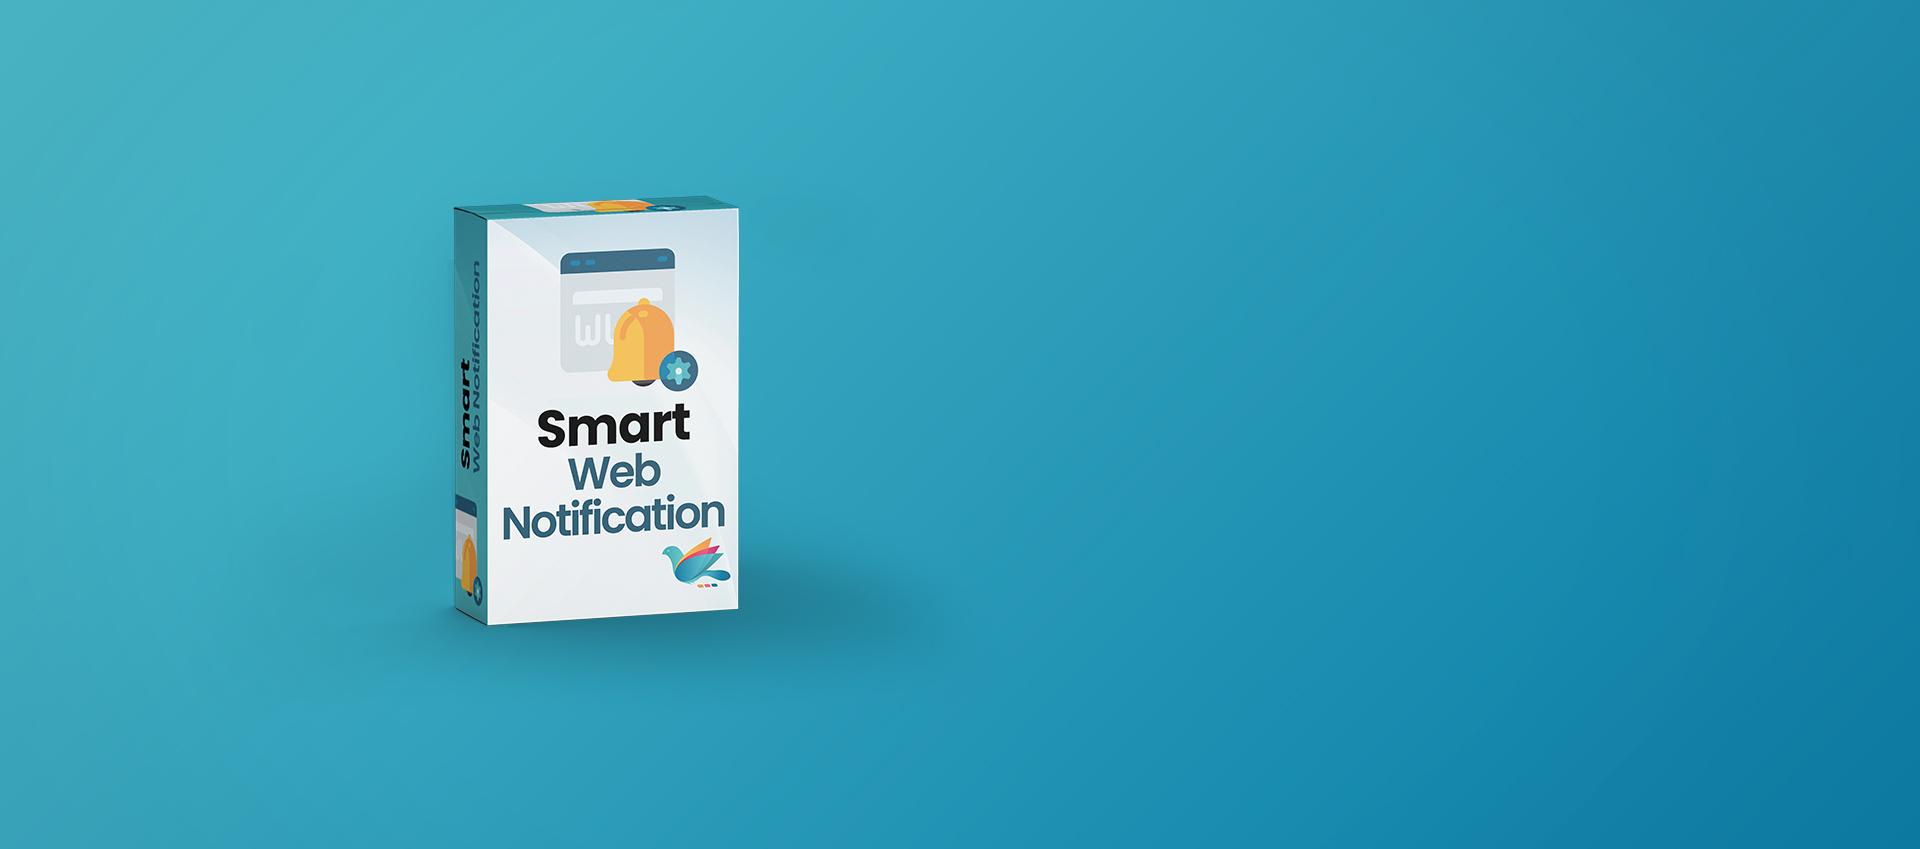 Smart Web Notification